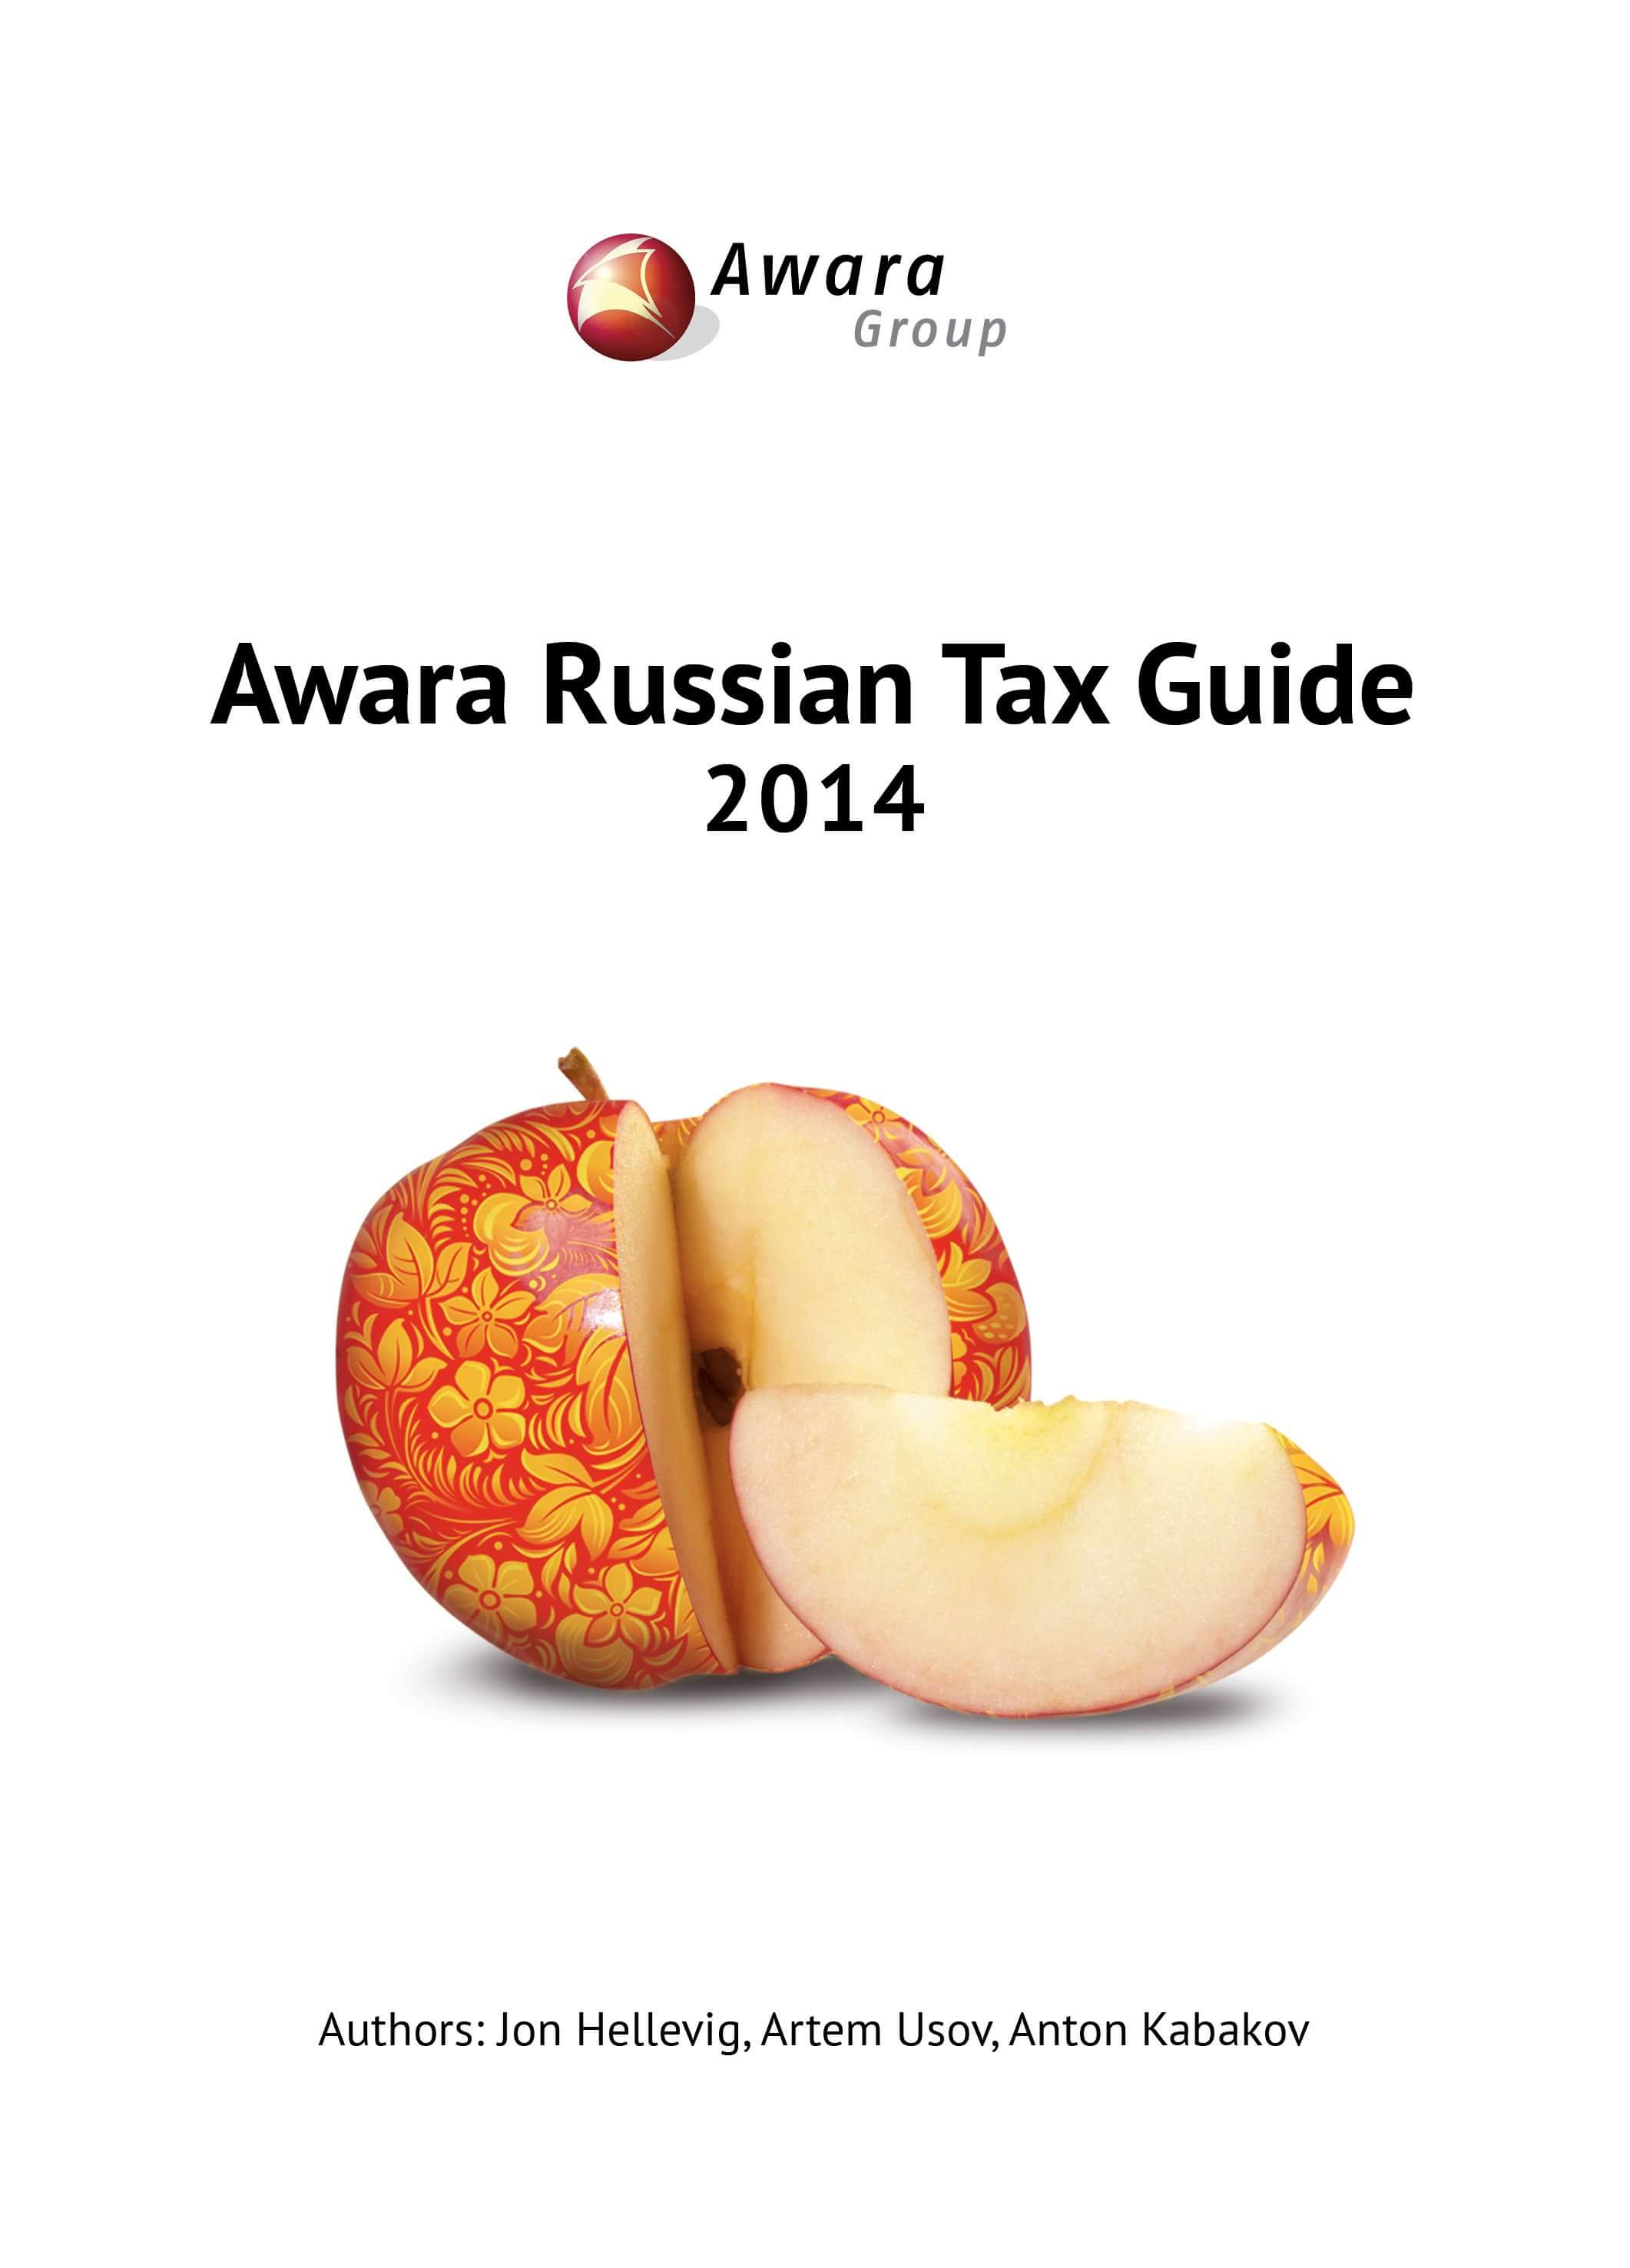 Авара налоги Росиии